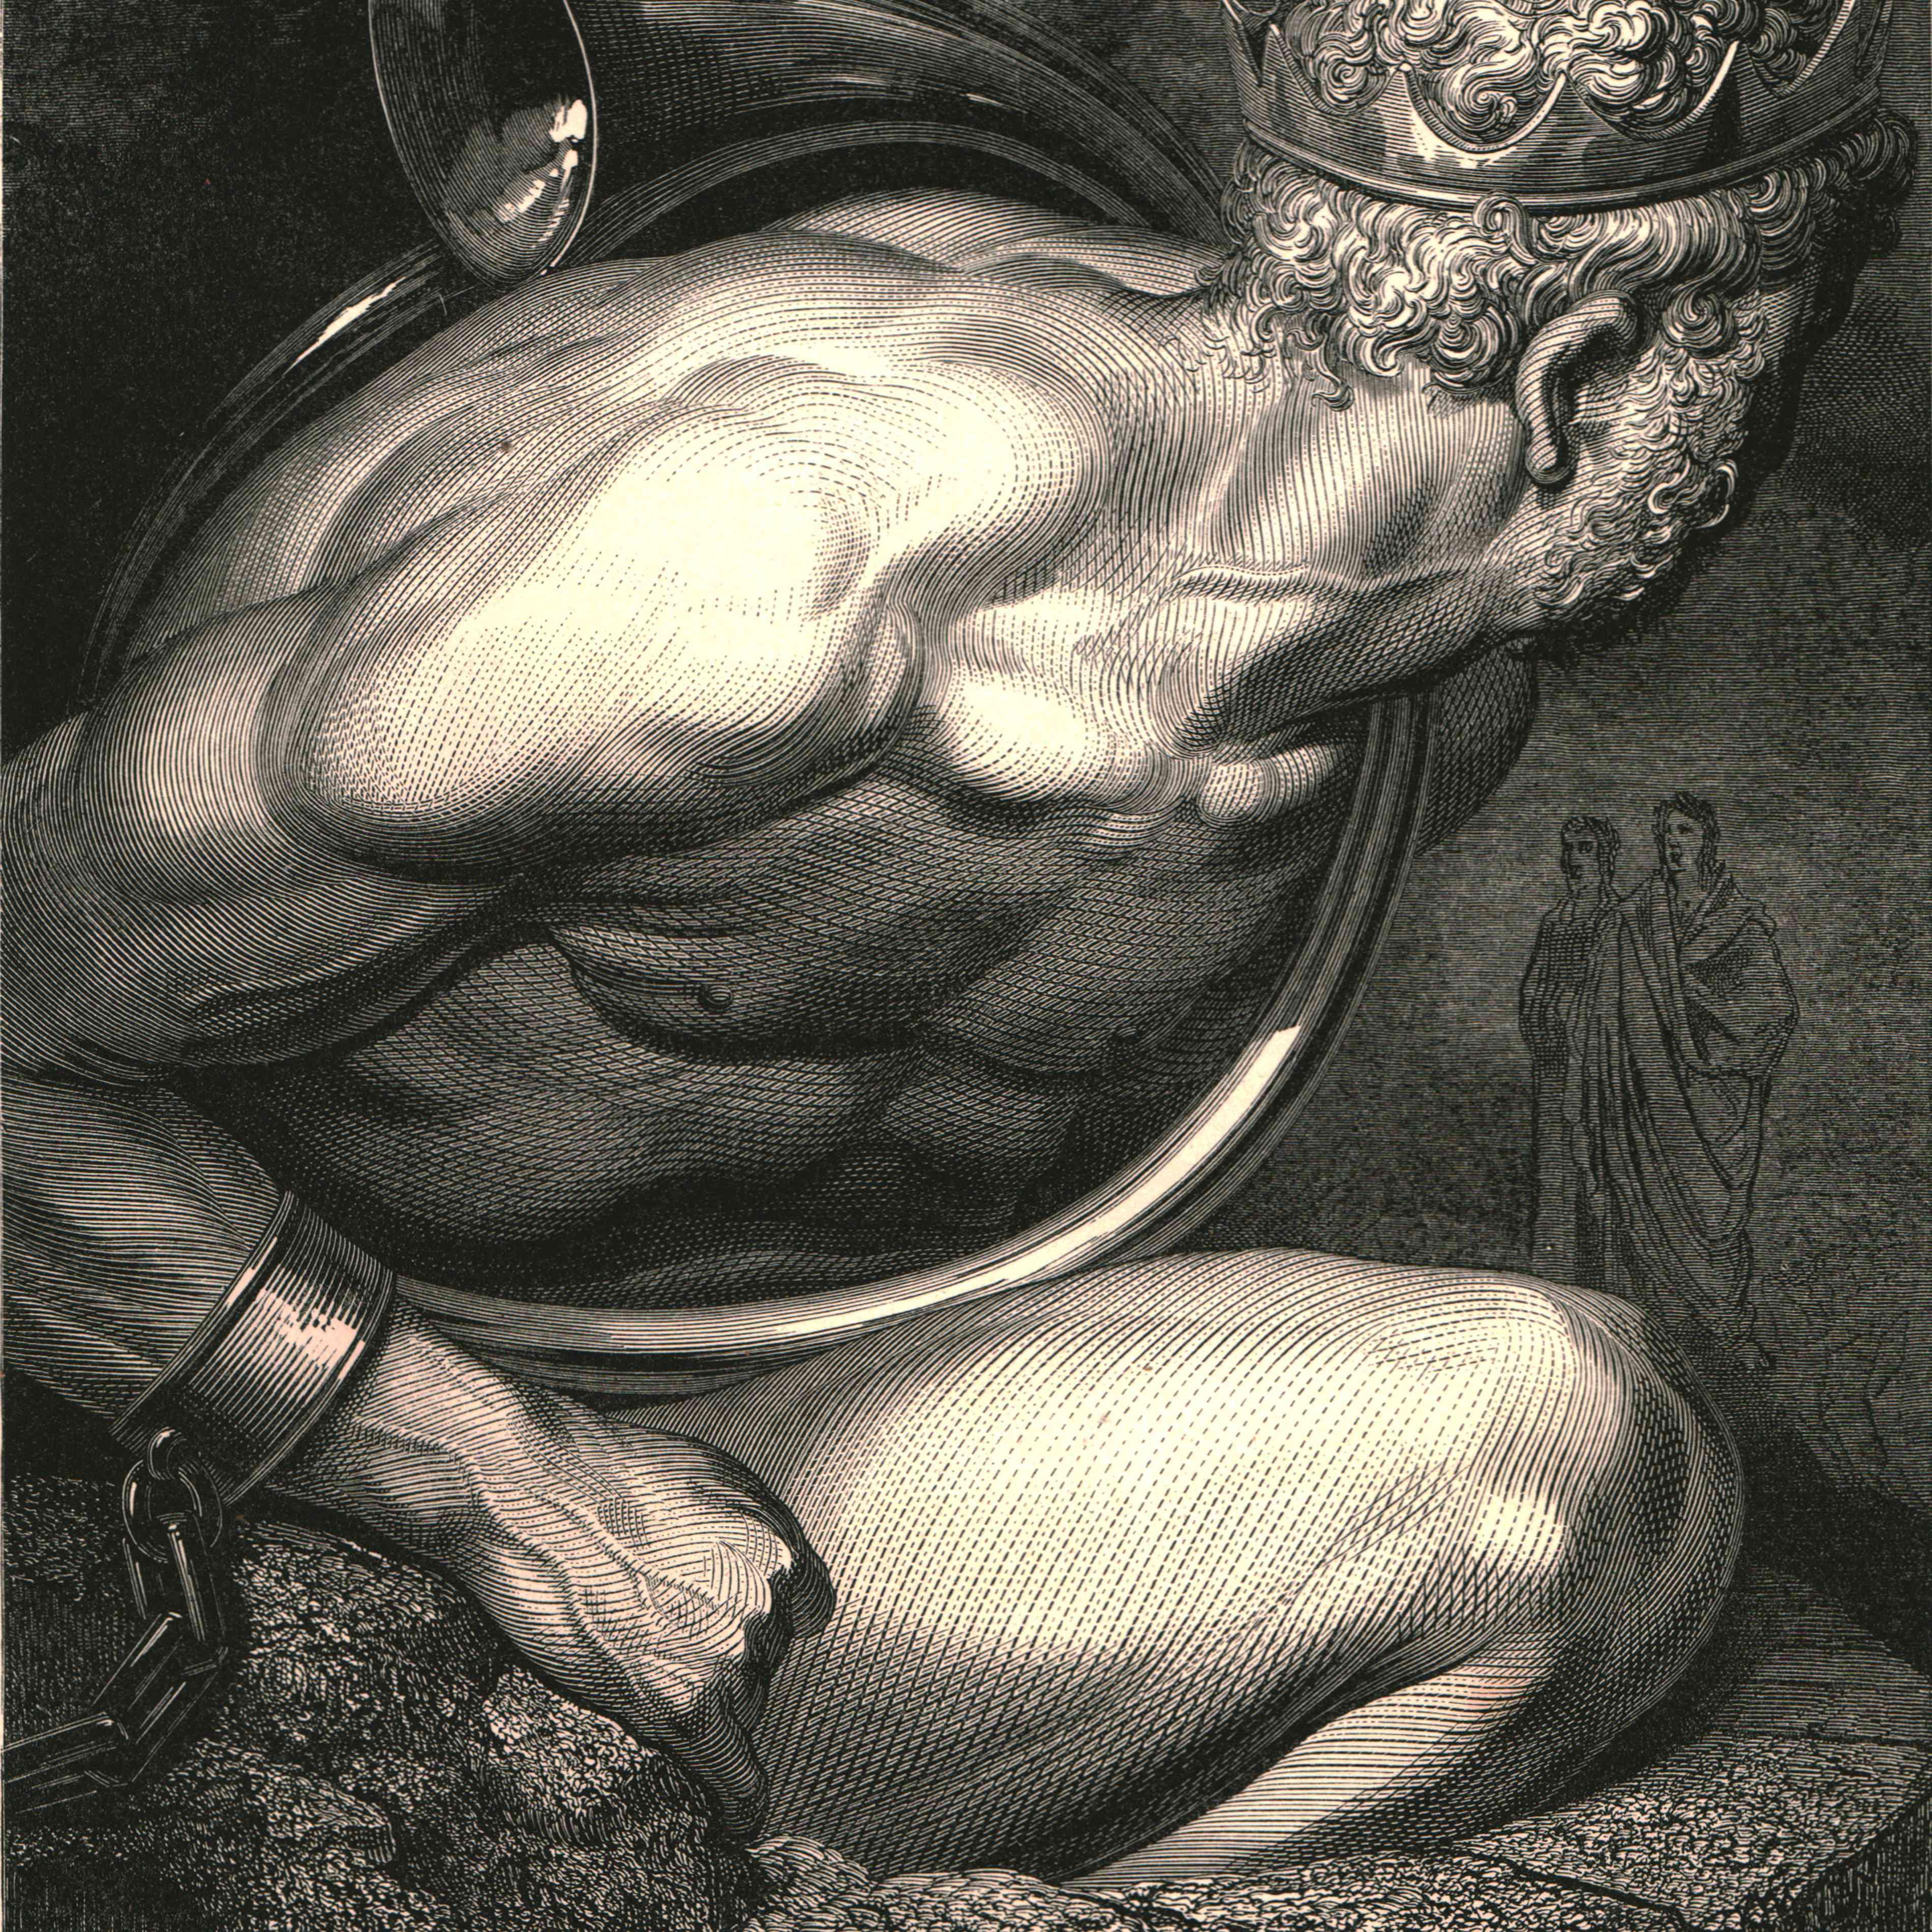 The Old Testament figure of Nimrod